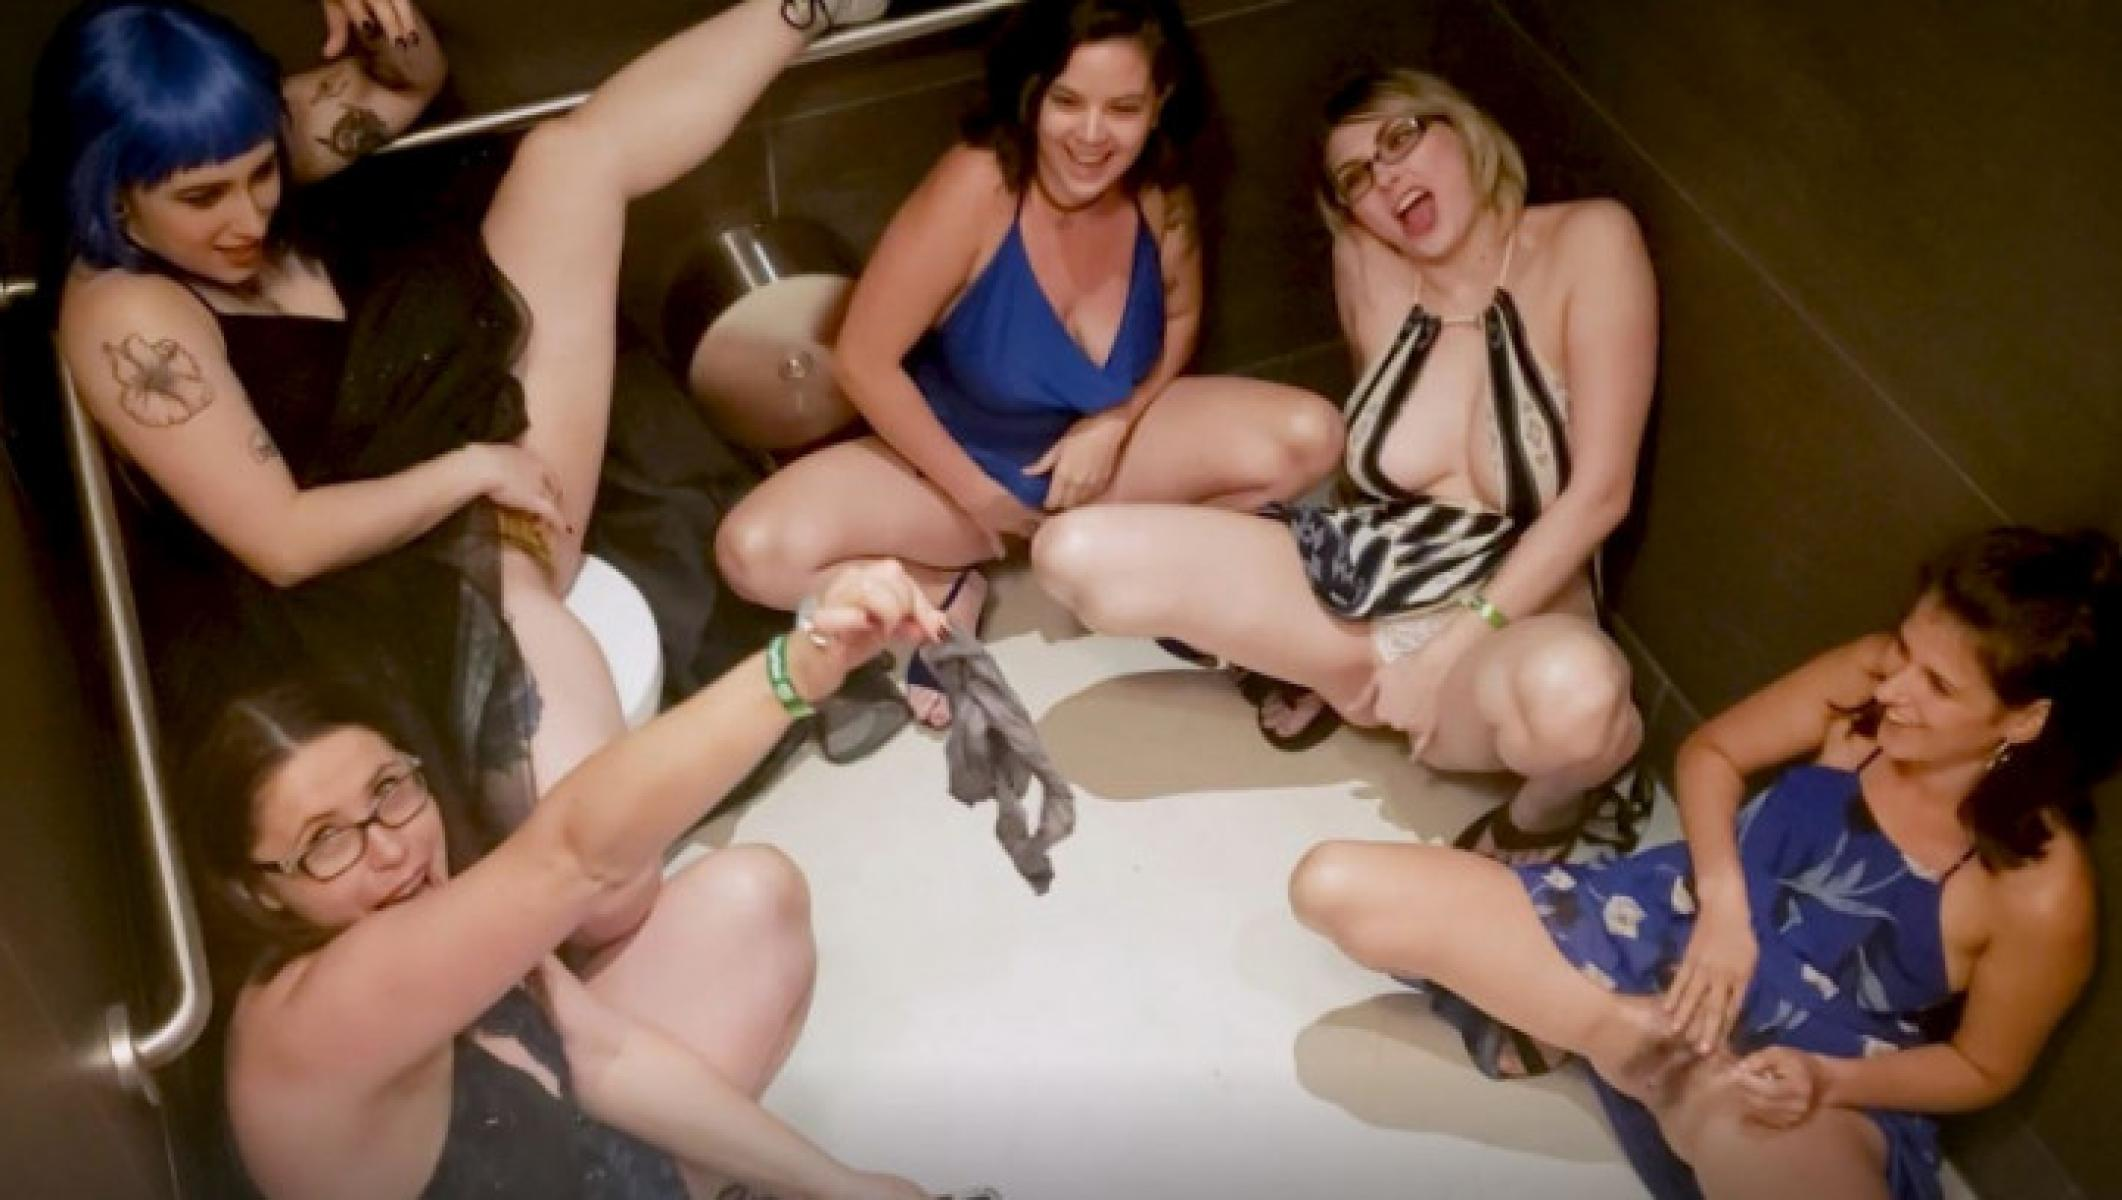 Messy lesbian orgy